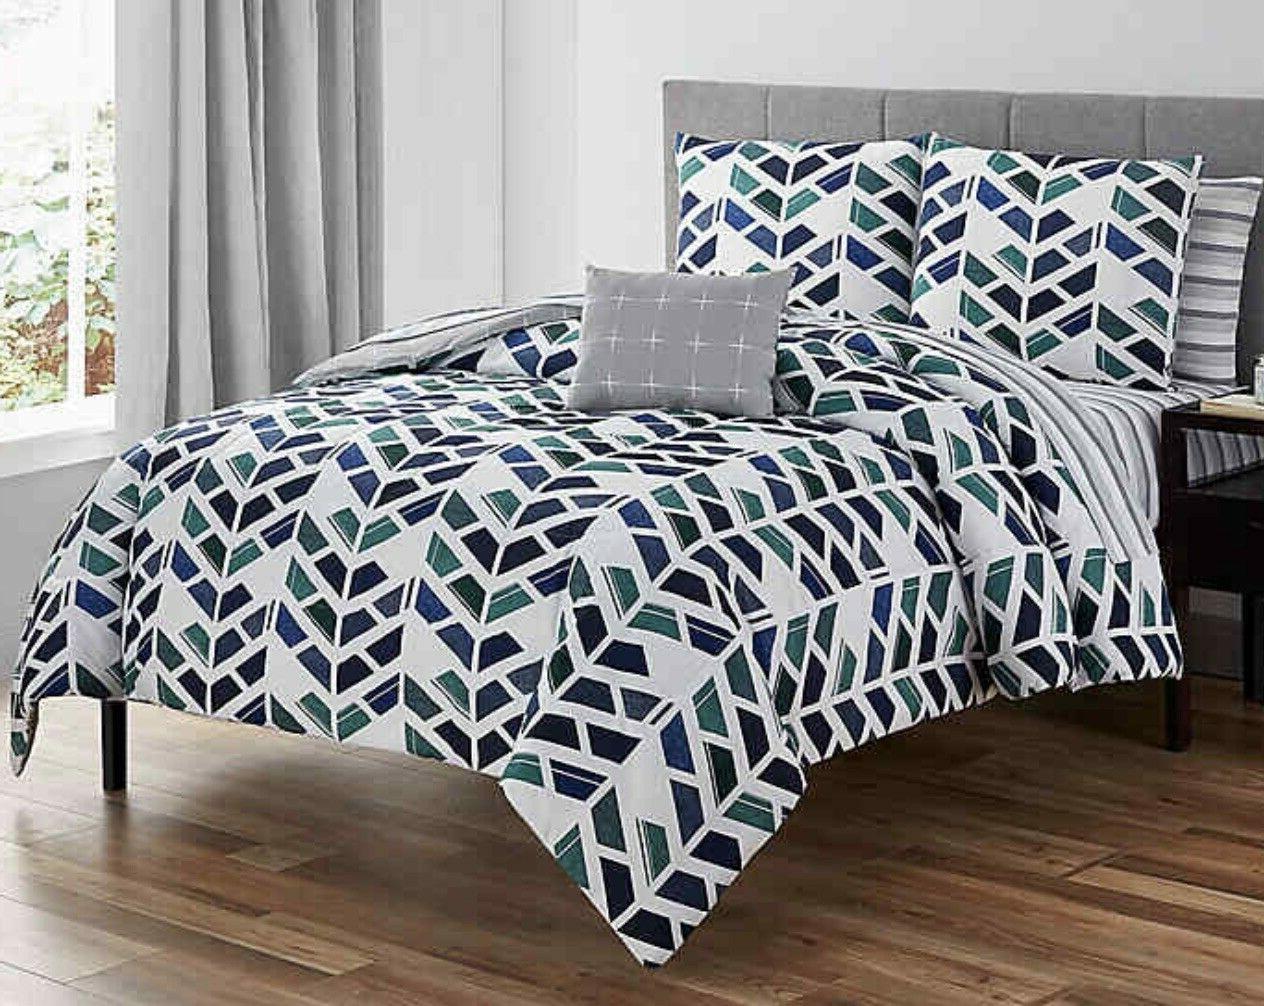 Rogan King Comforter Navy Style Super